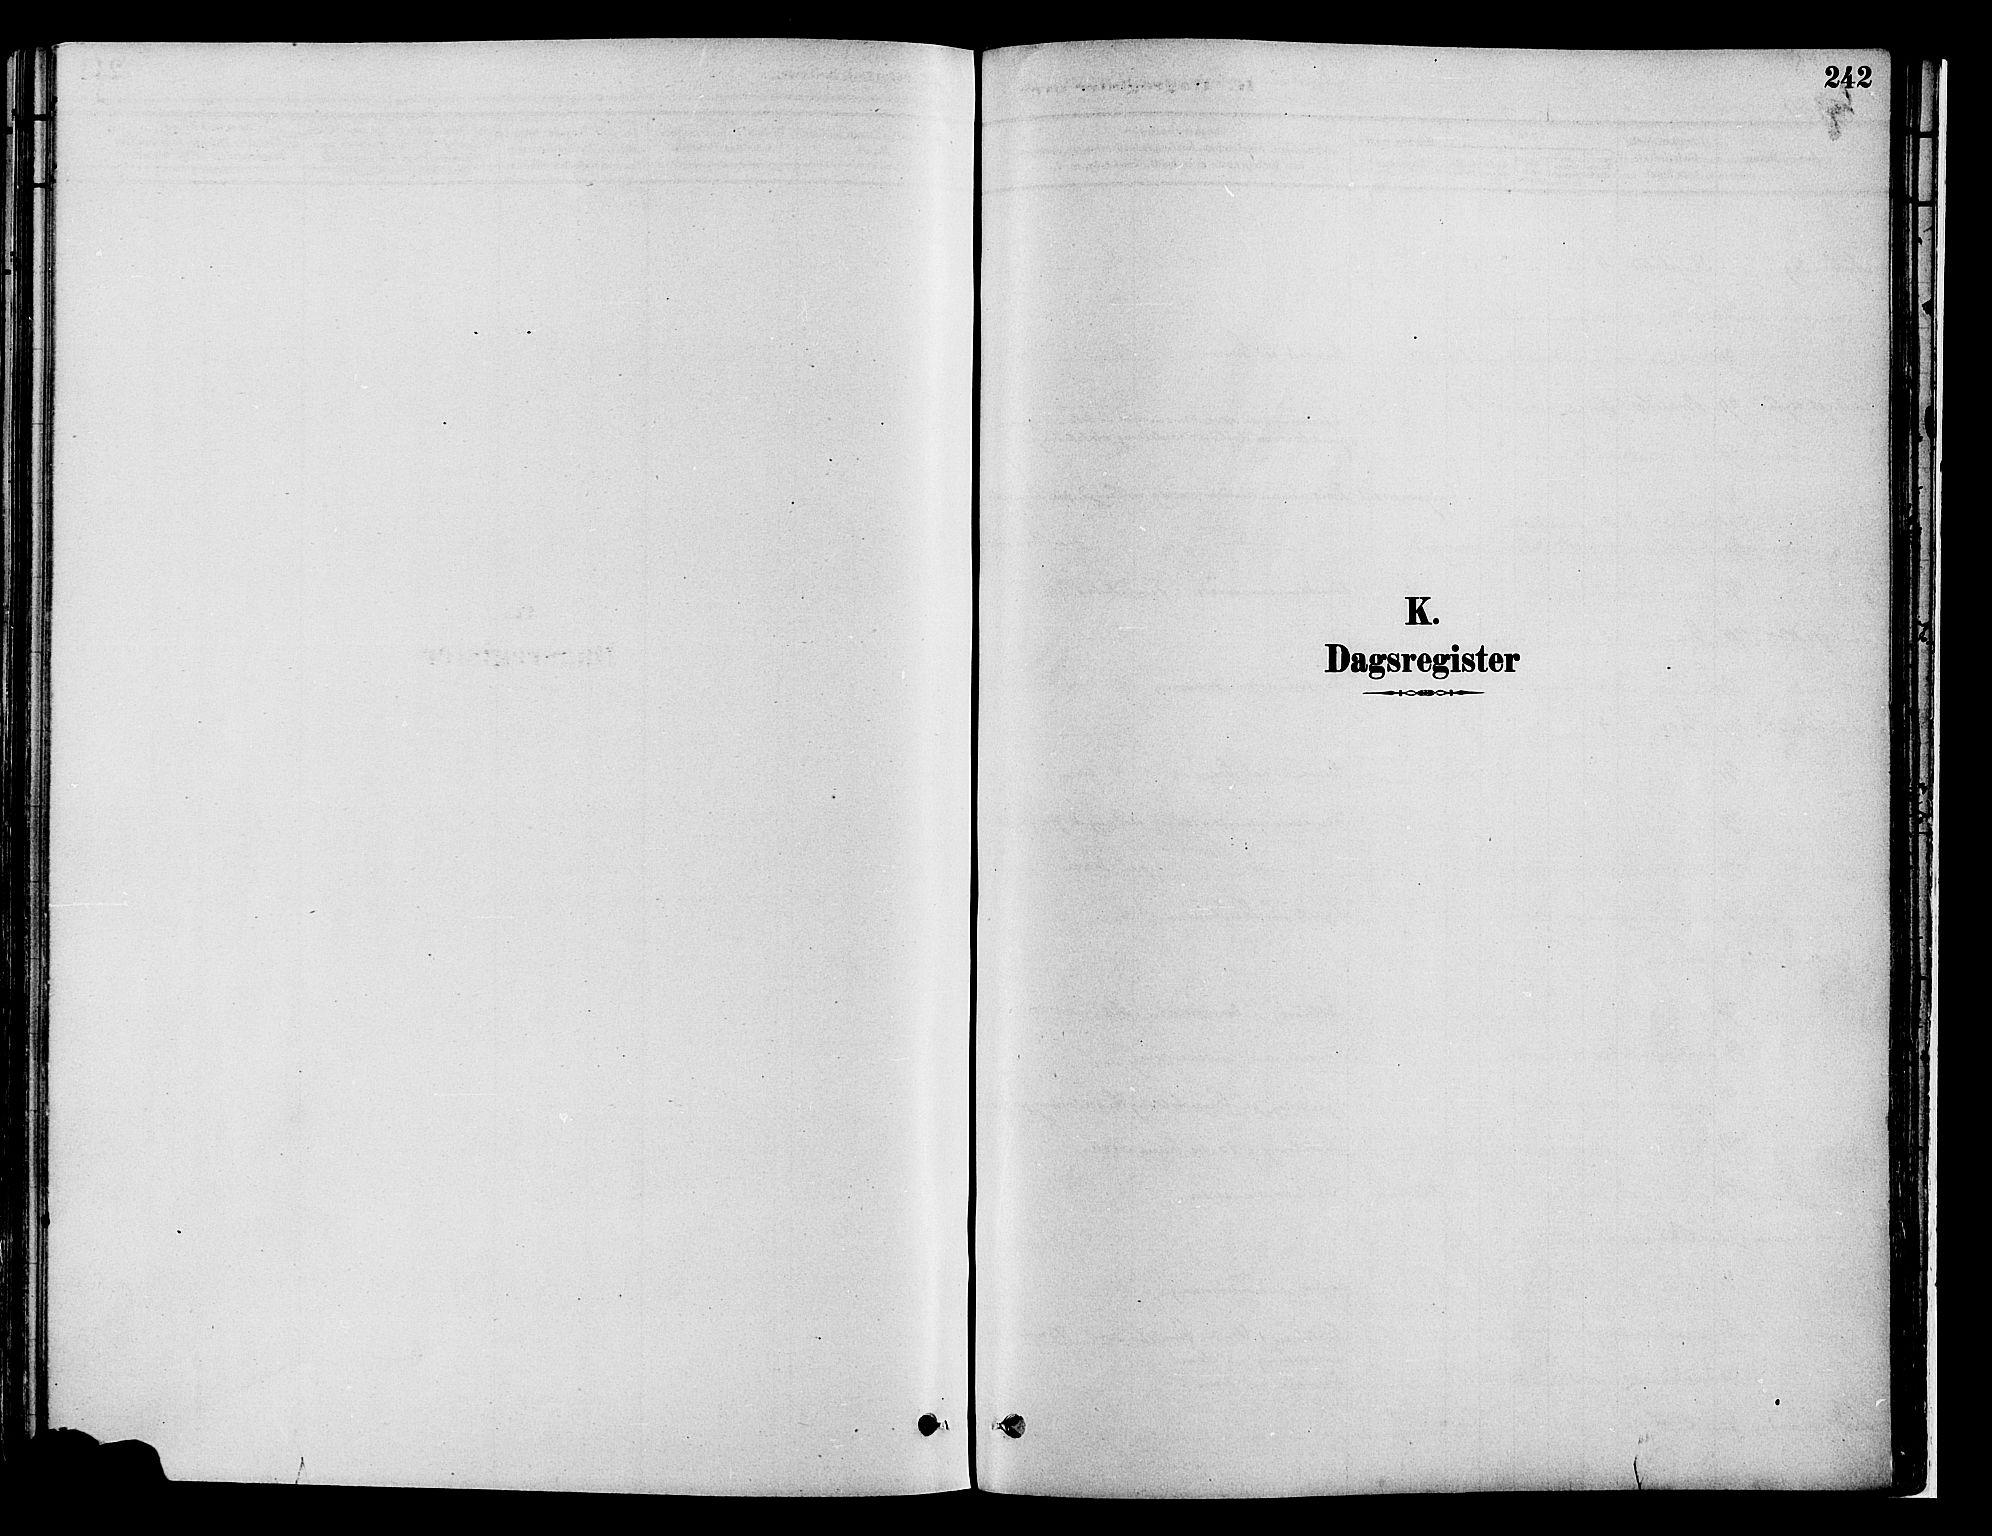 SAH, Gran prestekontor, Ministerialbok nr. 14, 1880-1889, s. 242